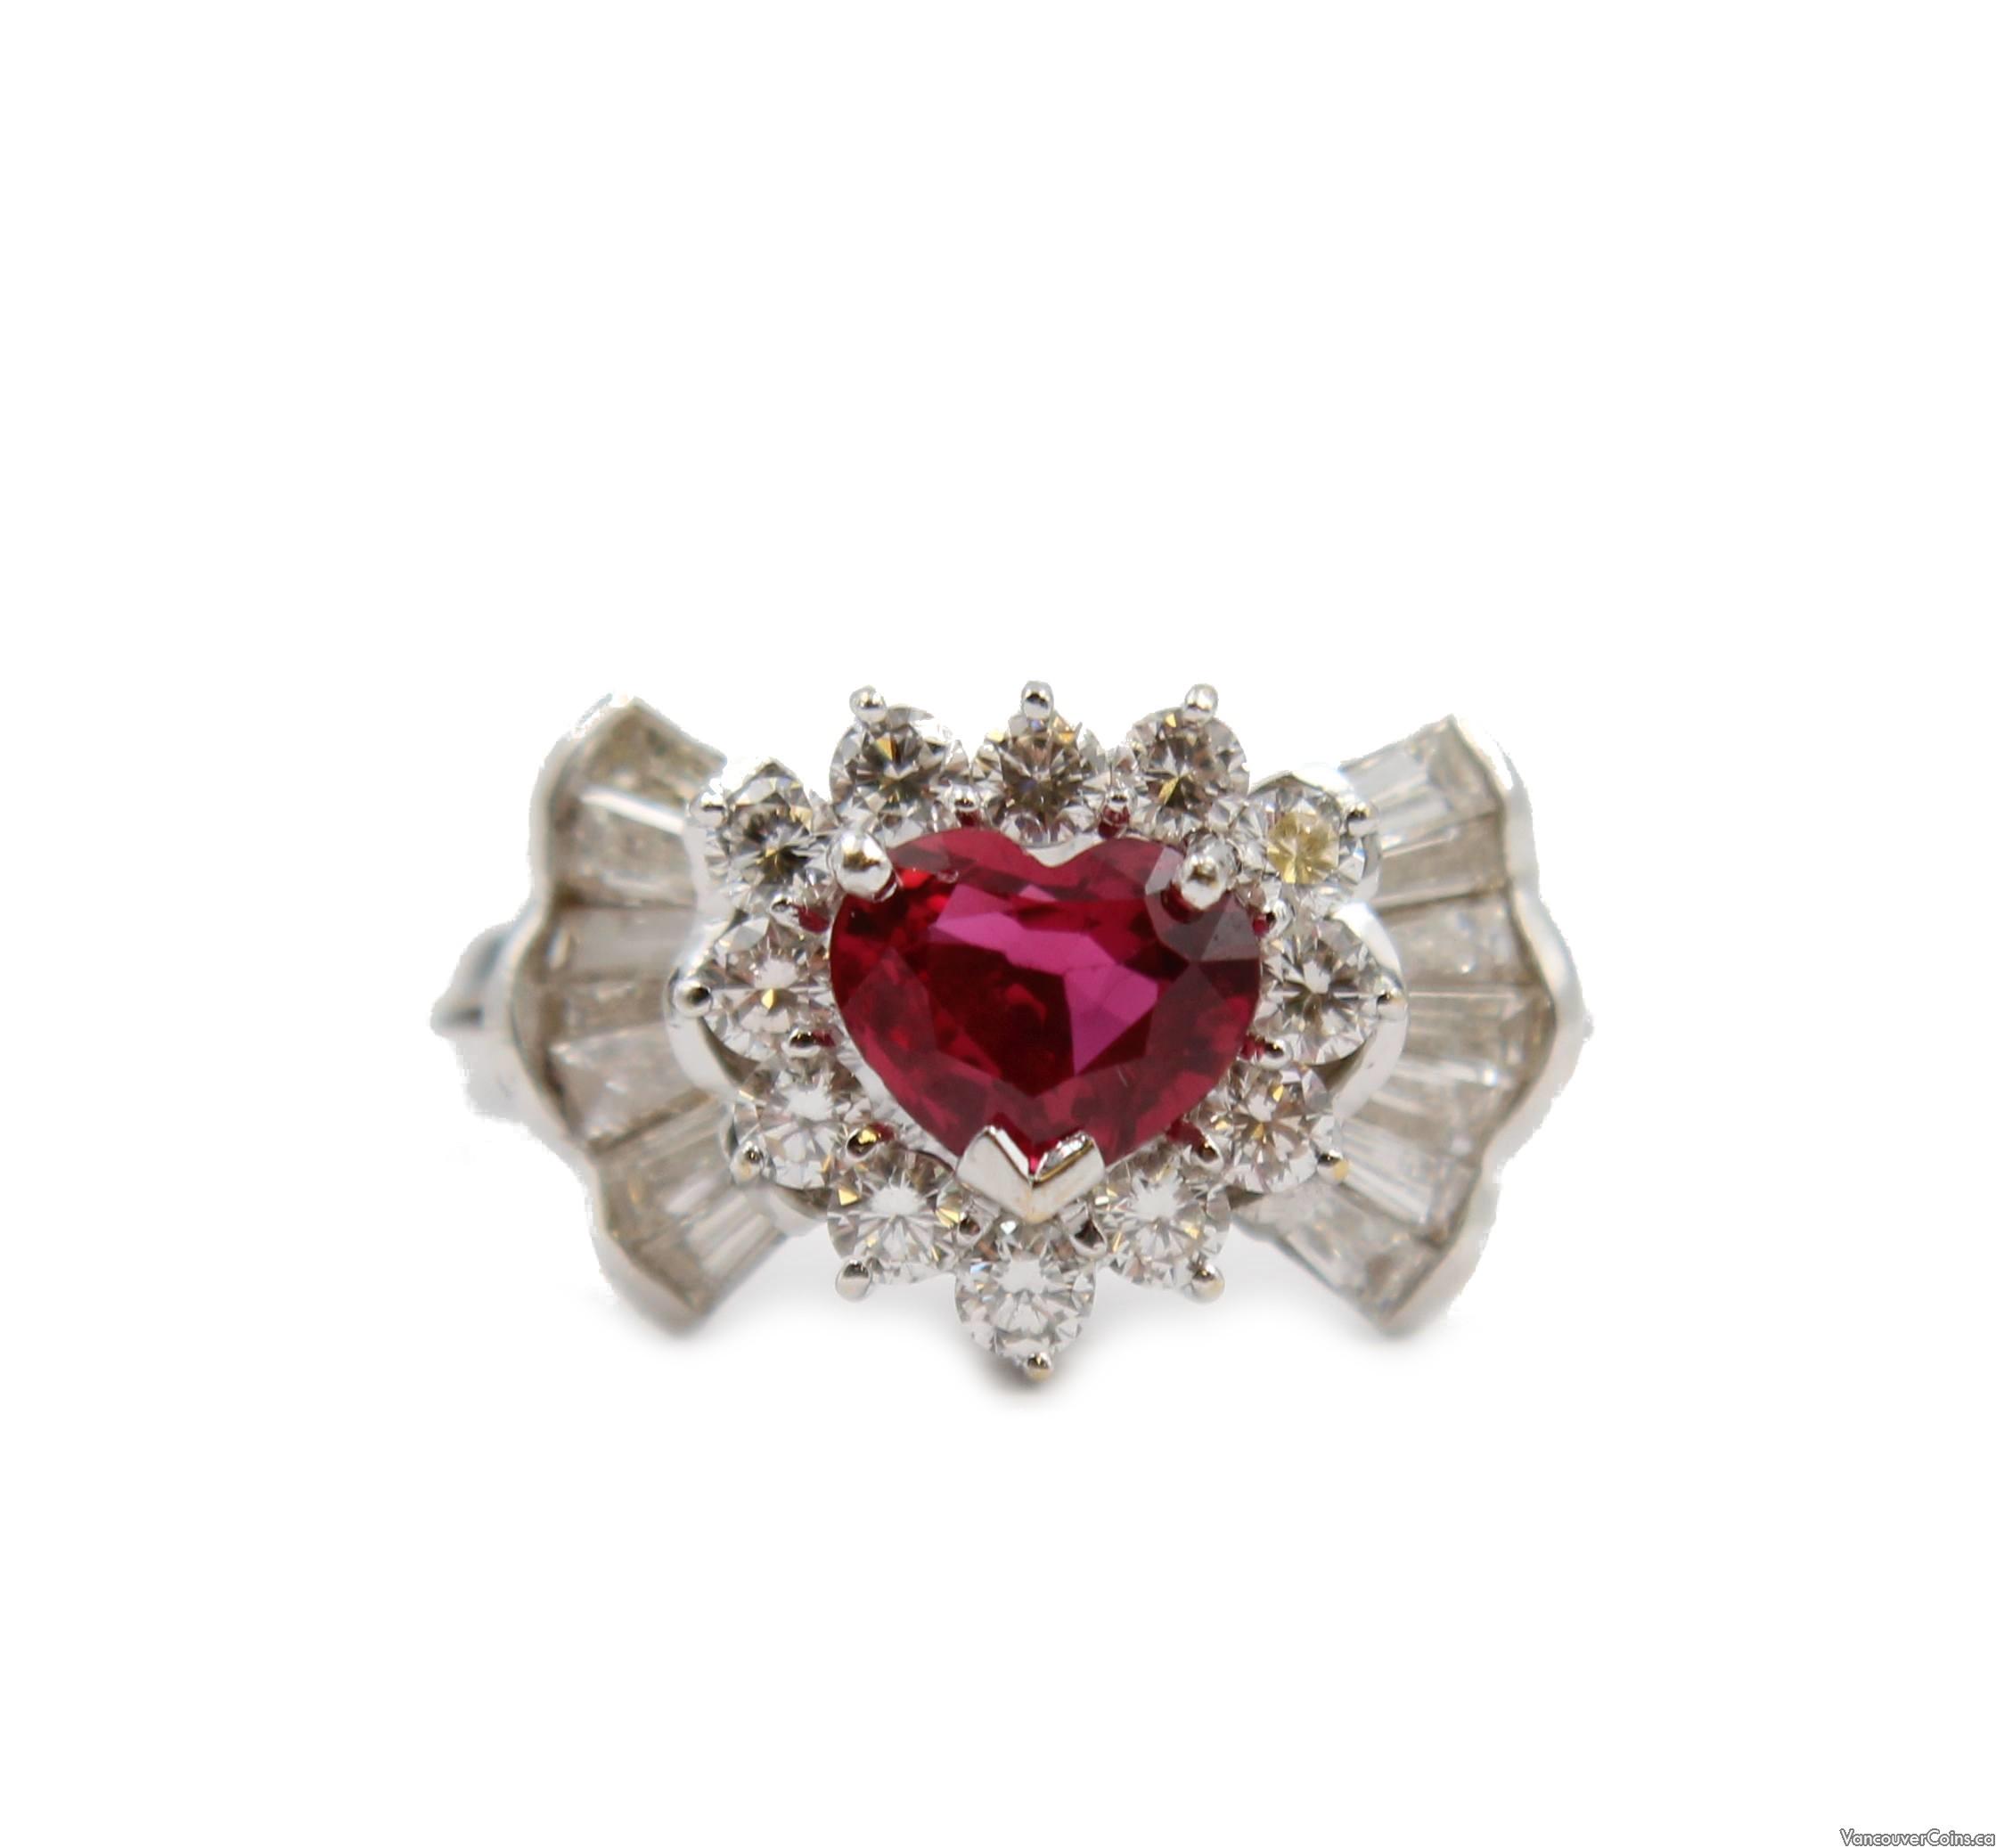 1.02ct Heart Ruby 18K gold ring & 1-carat Diamonds